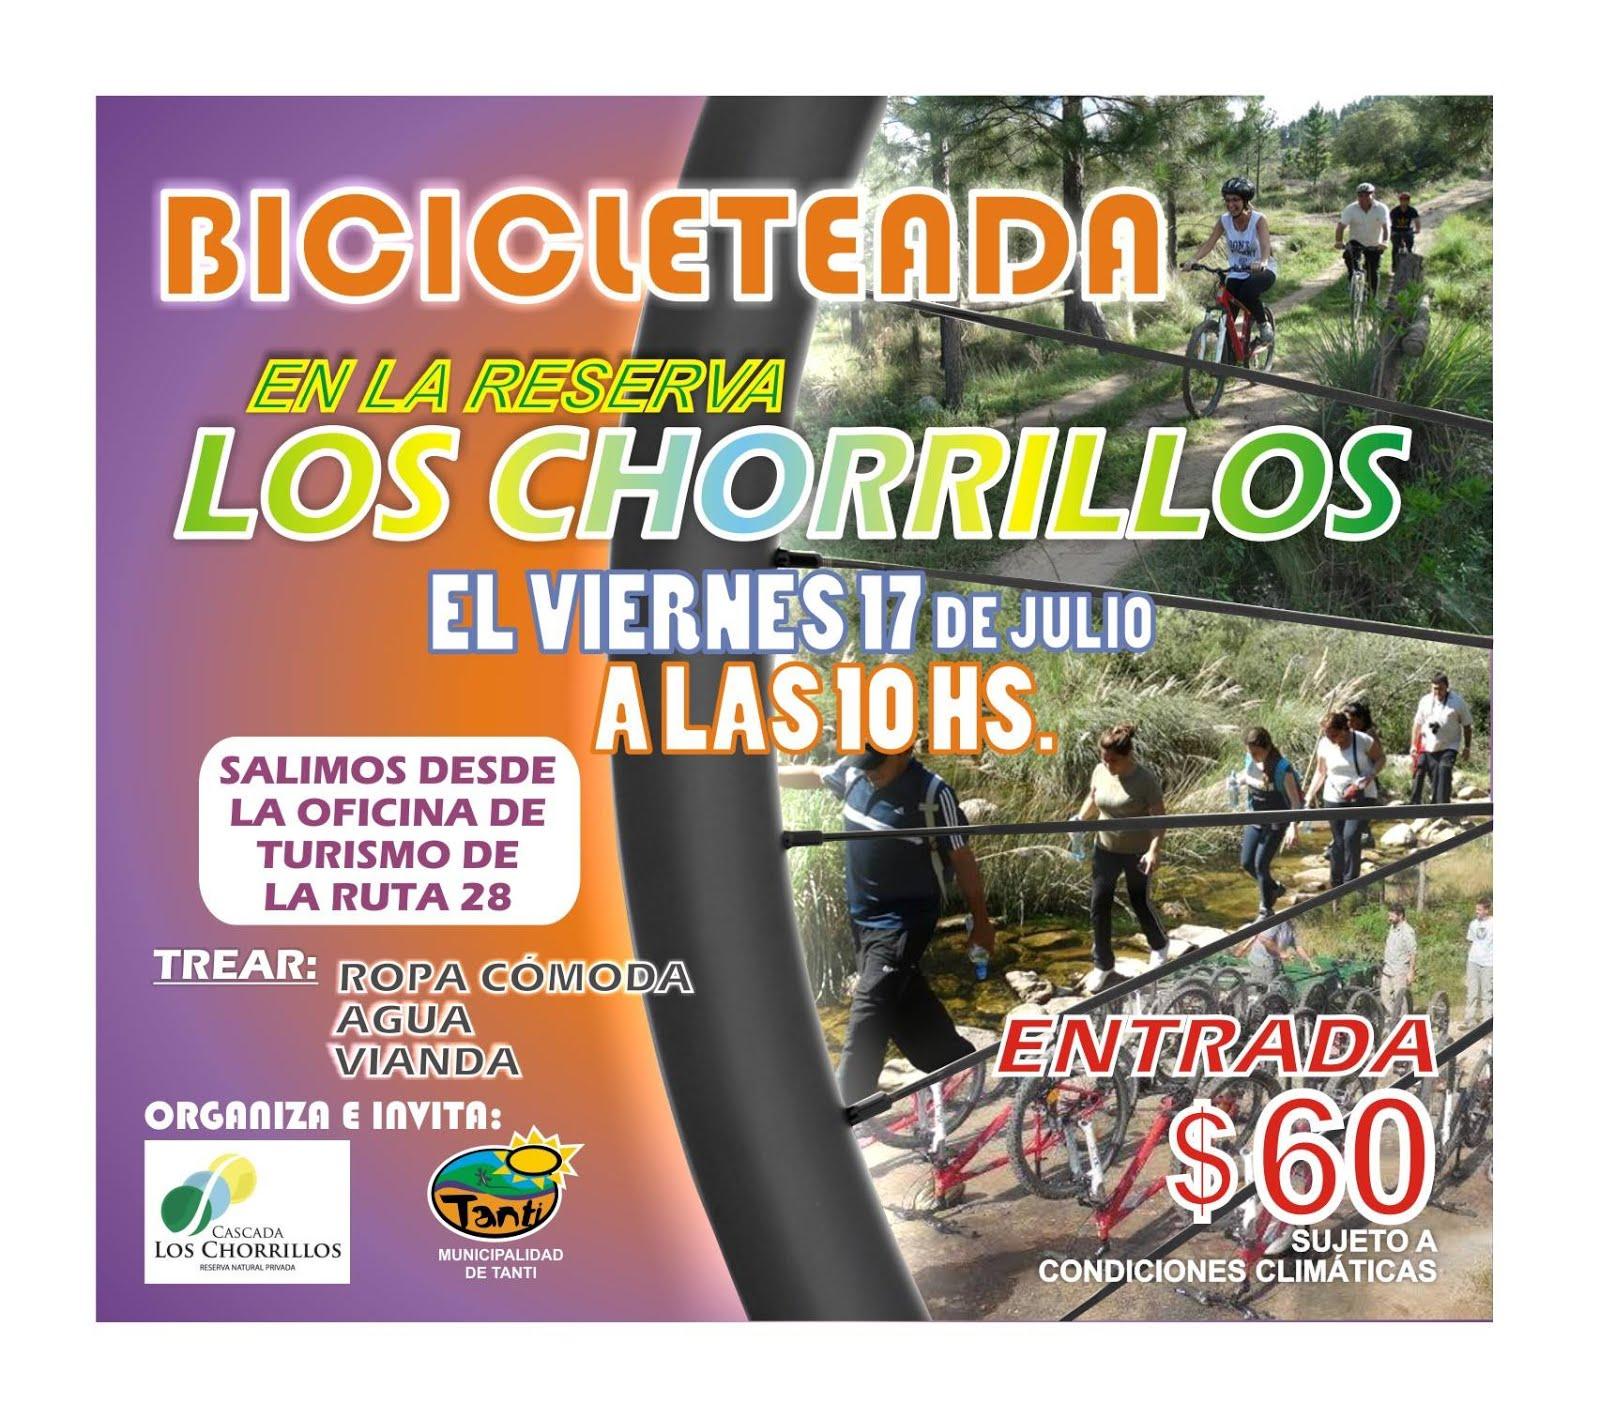 BICICLETEADA EN LOS CHORRILLOS - TANTI